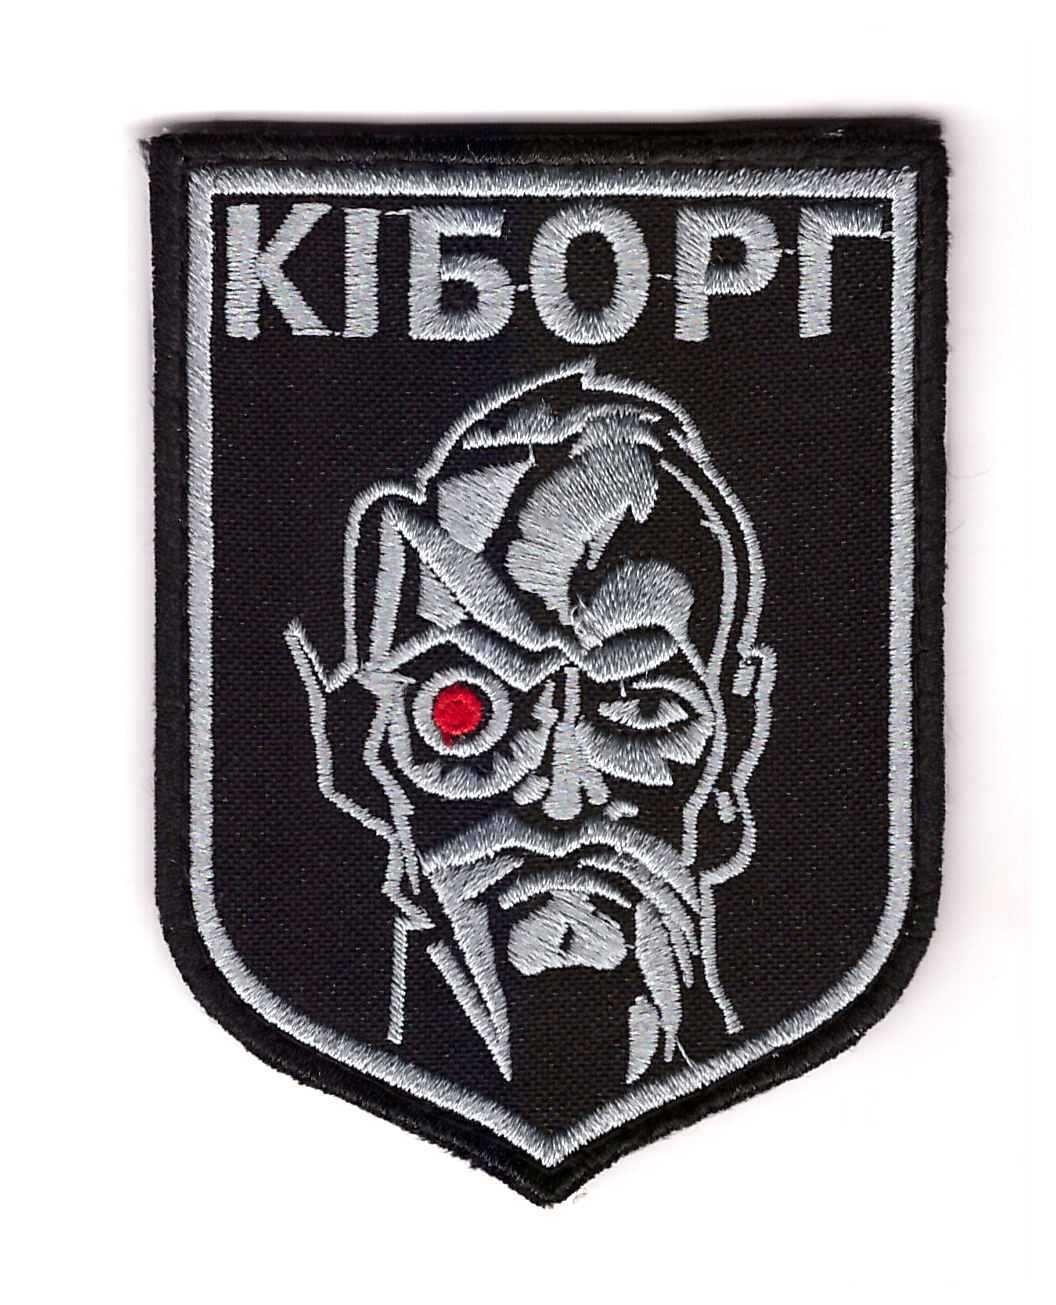 Ukrainian Army Tactical Morale Patch Special Forces Battalion Cyborg Kiborg